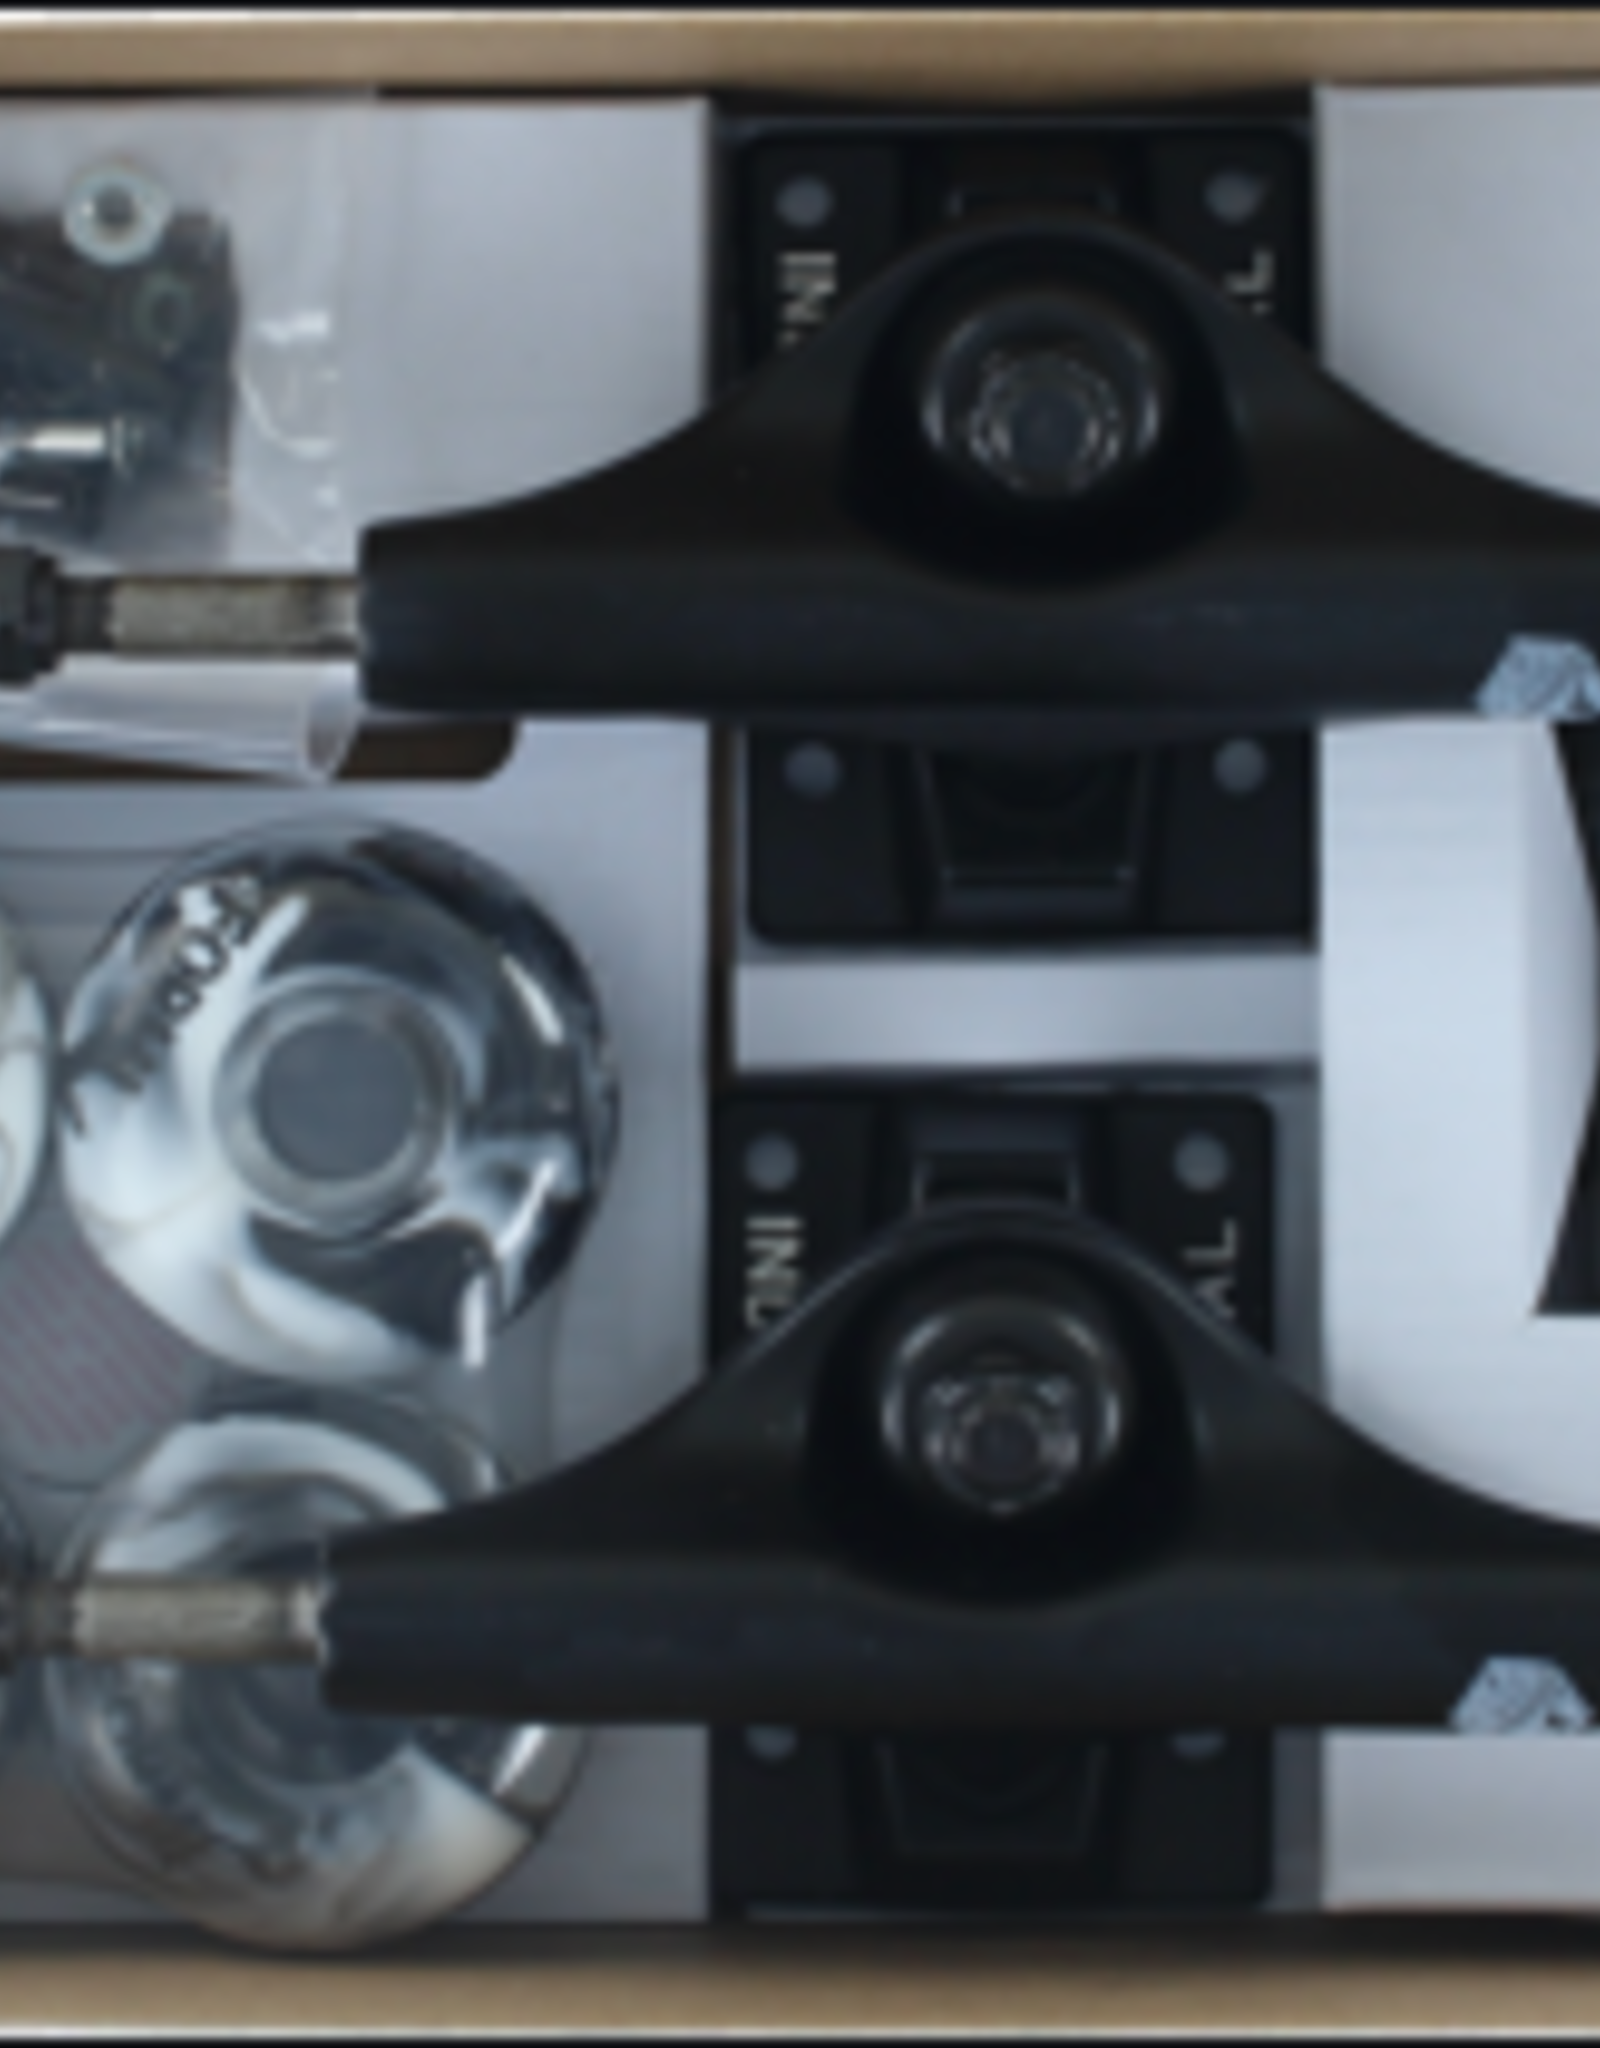 EASTERN SKATE INS COMPONENT PACK 5.0BLK/BLK w/52mm BK/WT SWIRL